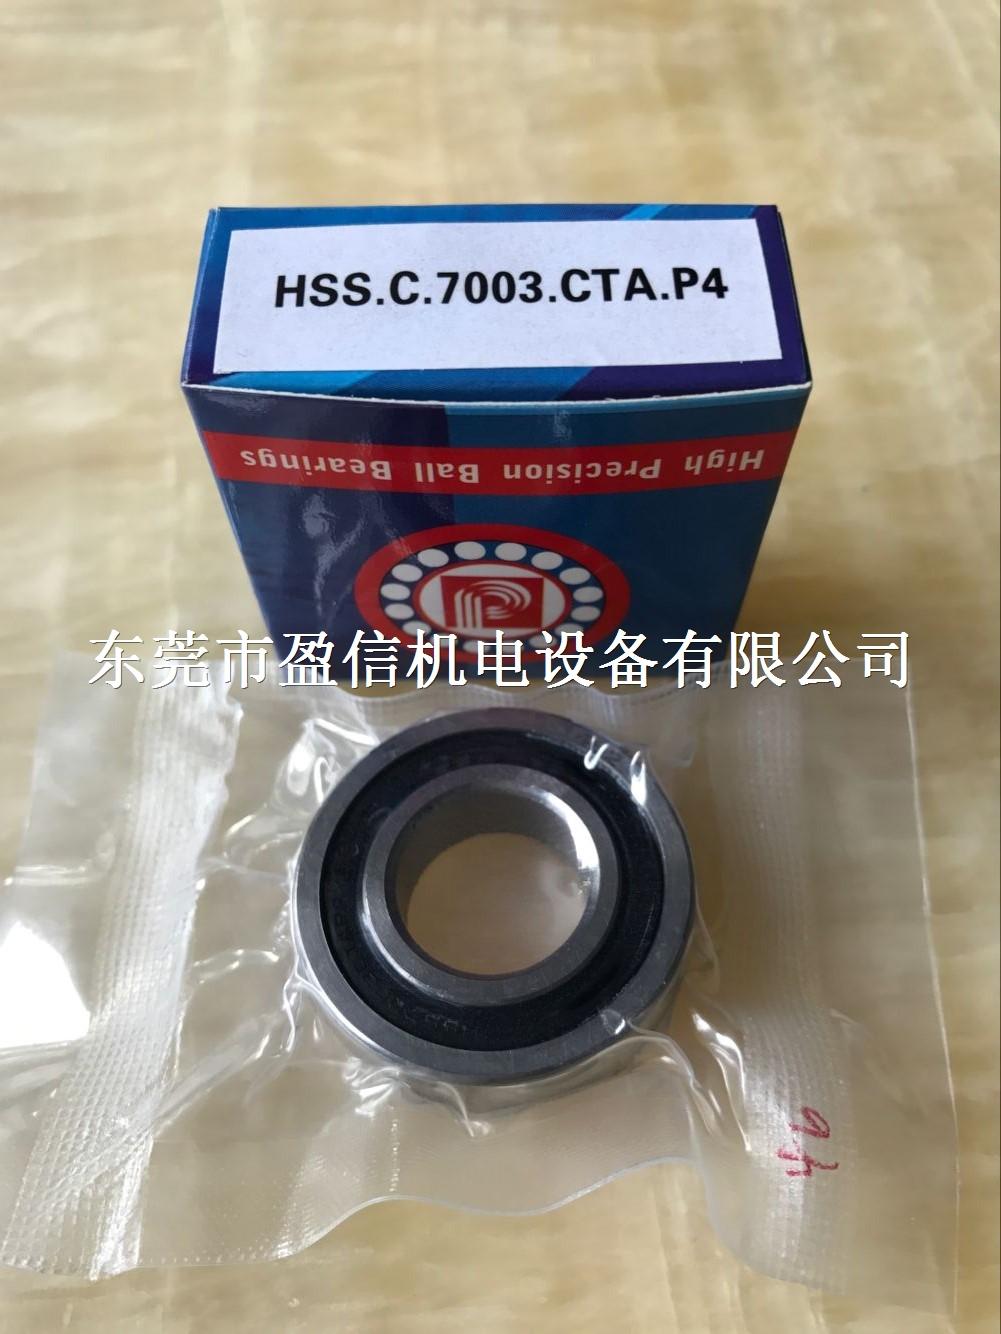 HSS.C.7003.CTA.P4